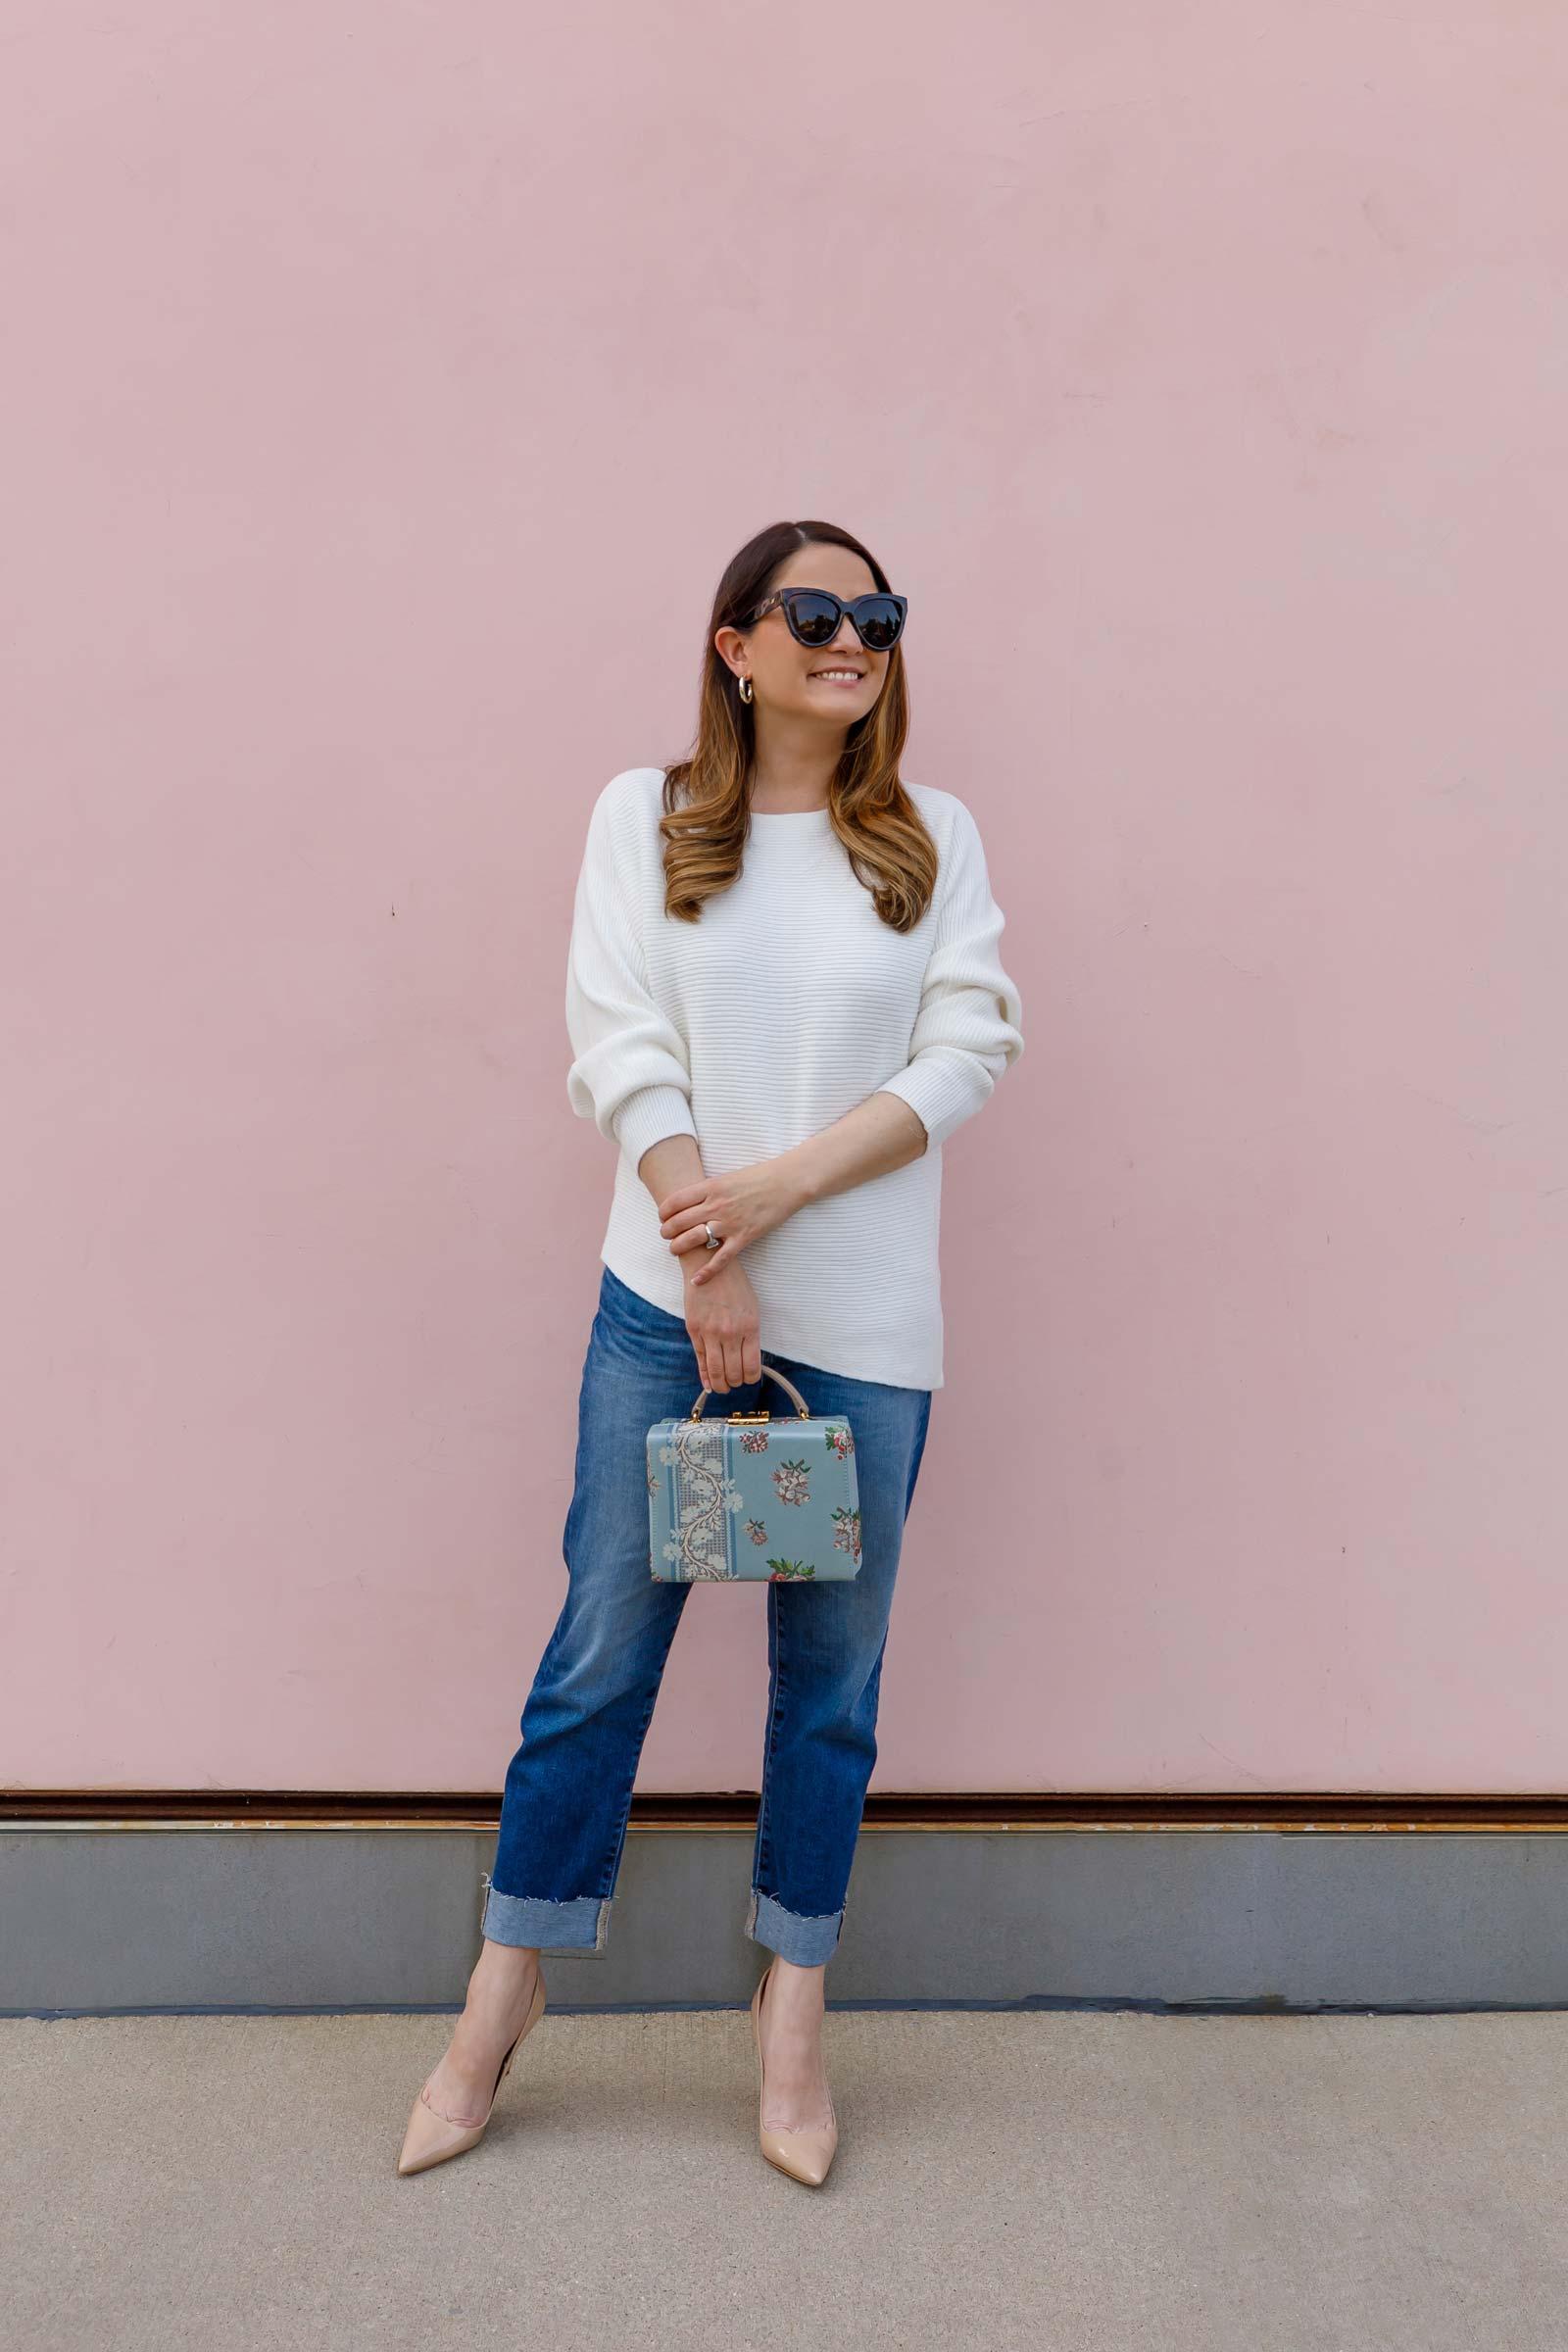 Jennifer Lake Boyfriend Jeans White Sweater